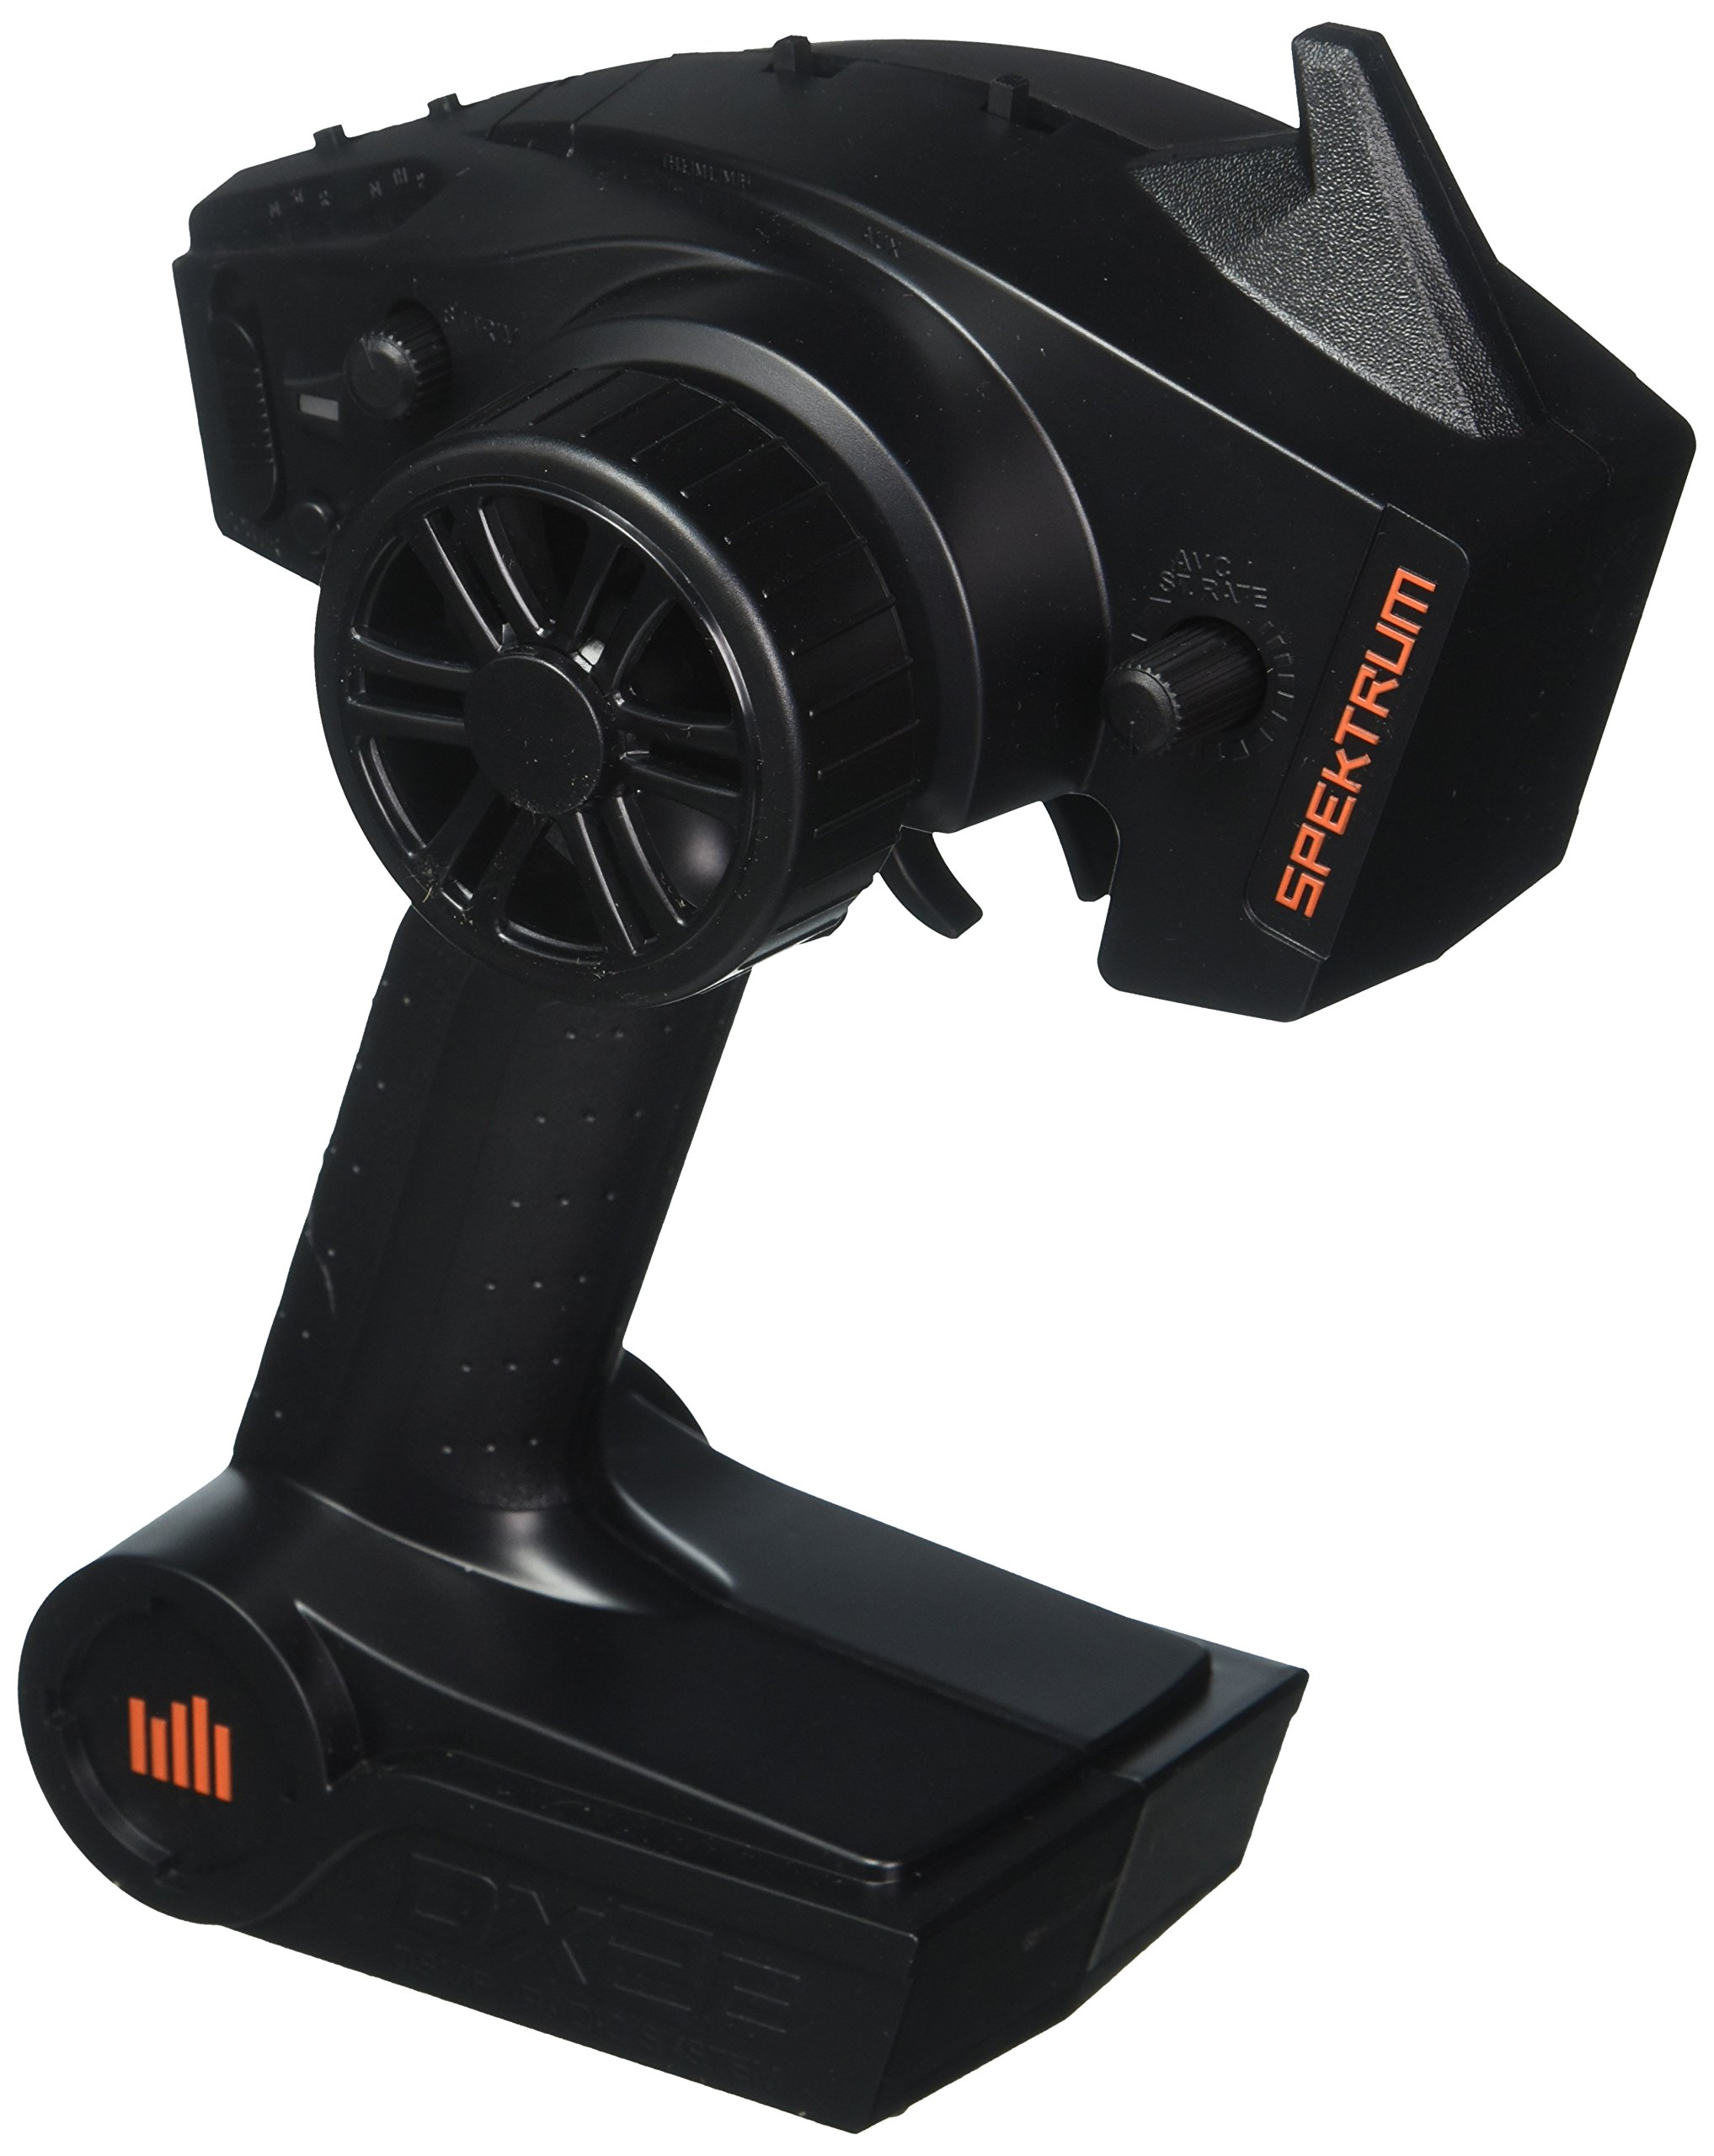 Spektrum DX2E Active 2-Channel DSMR Transmitter with SR310 Radio Control Vehicle Transmitters